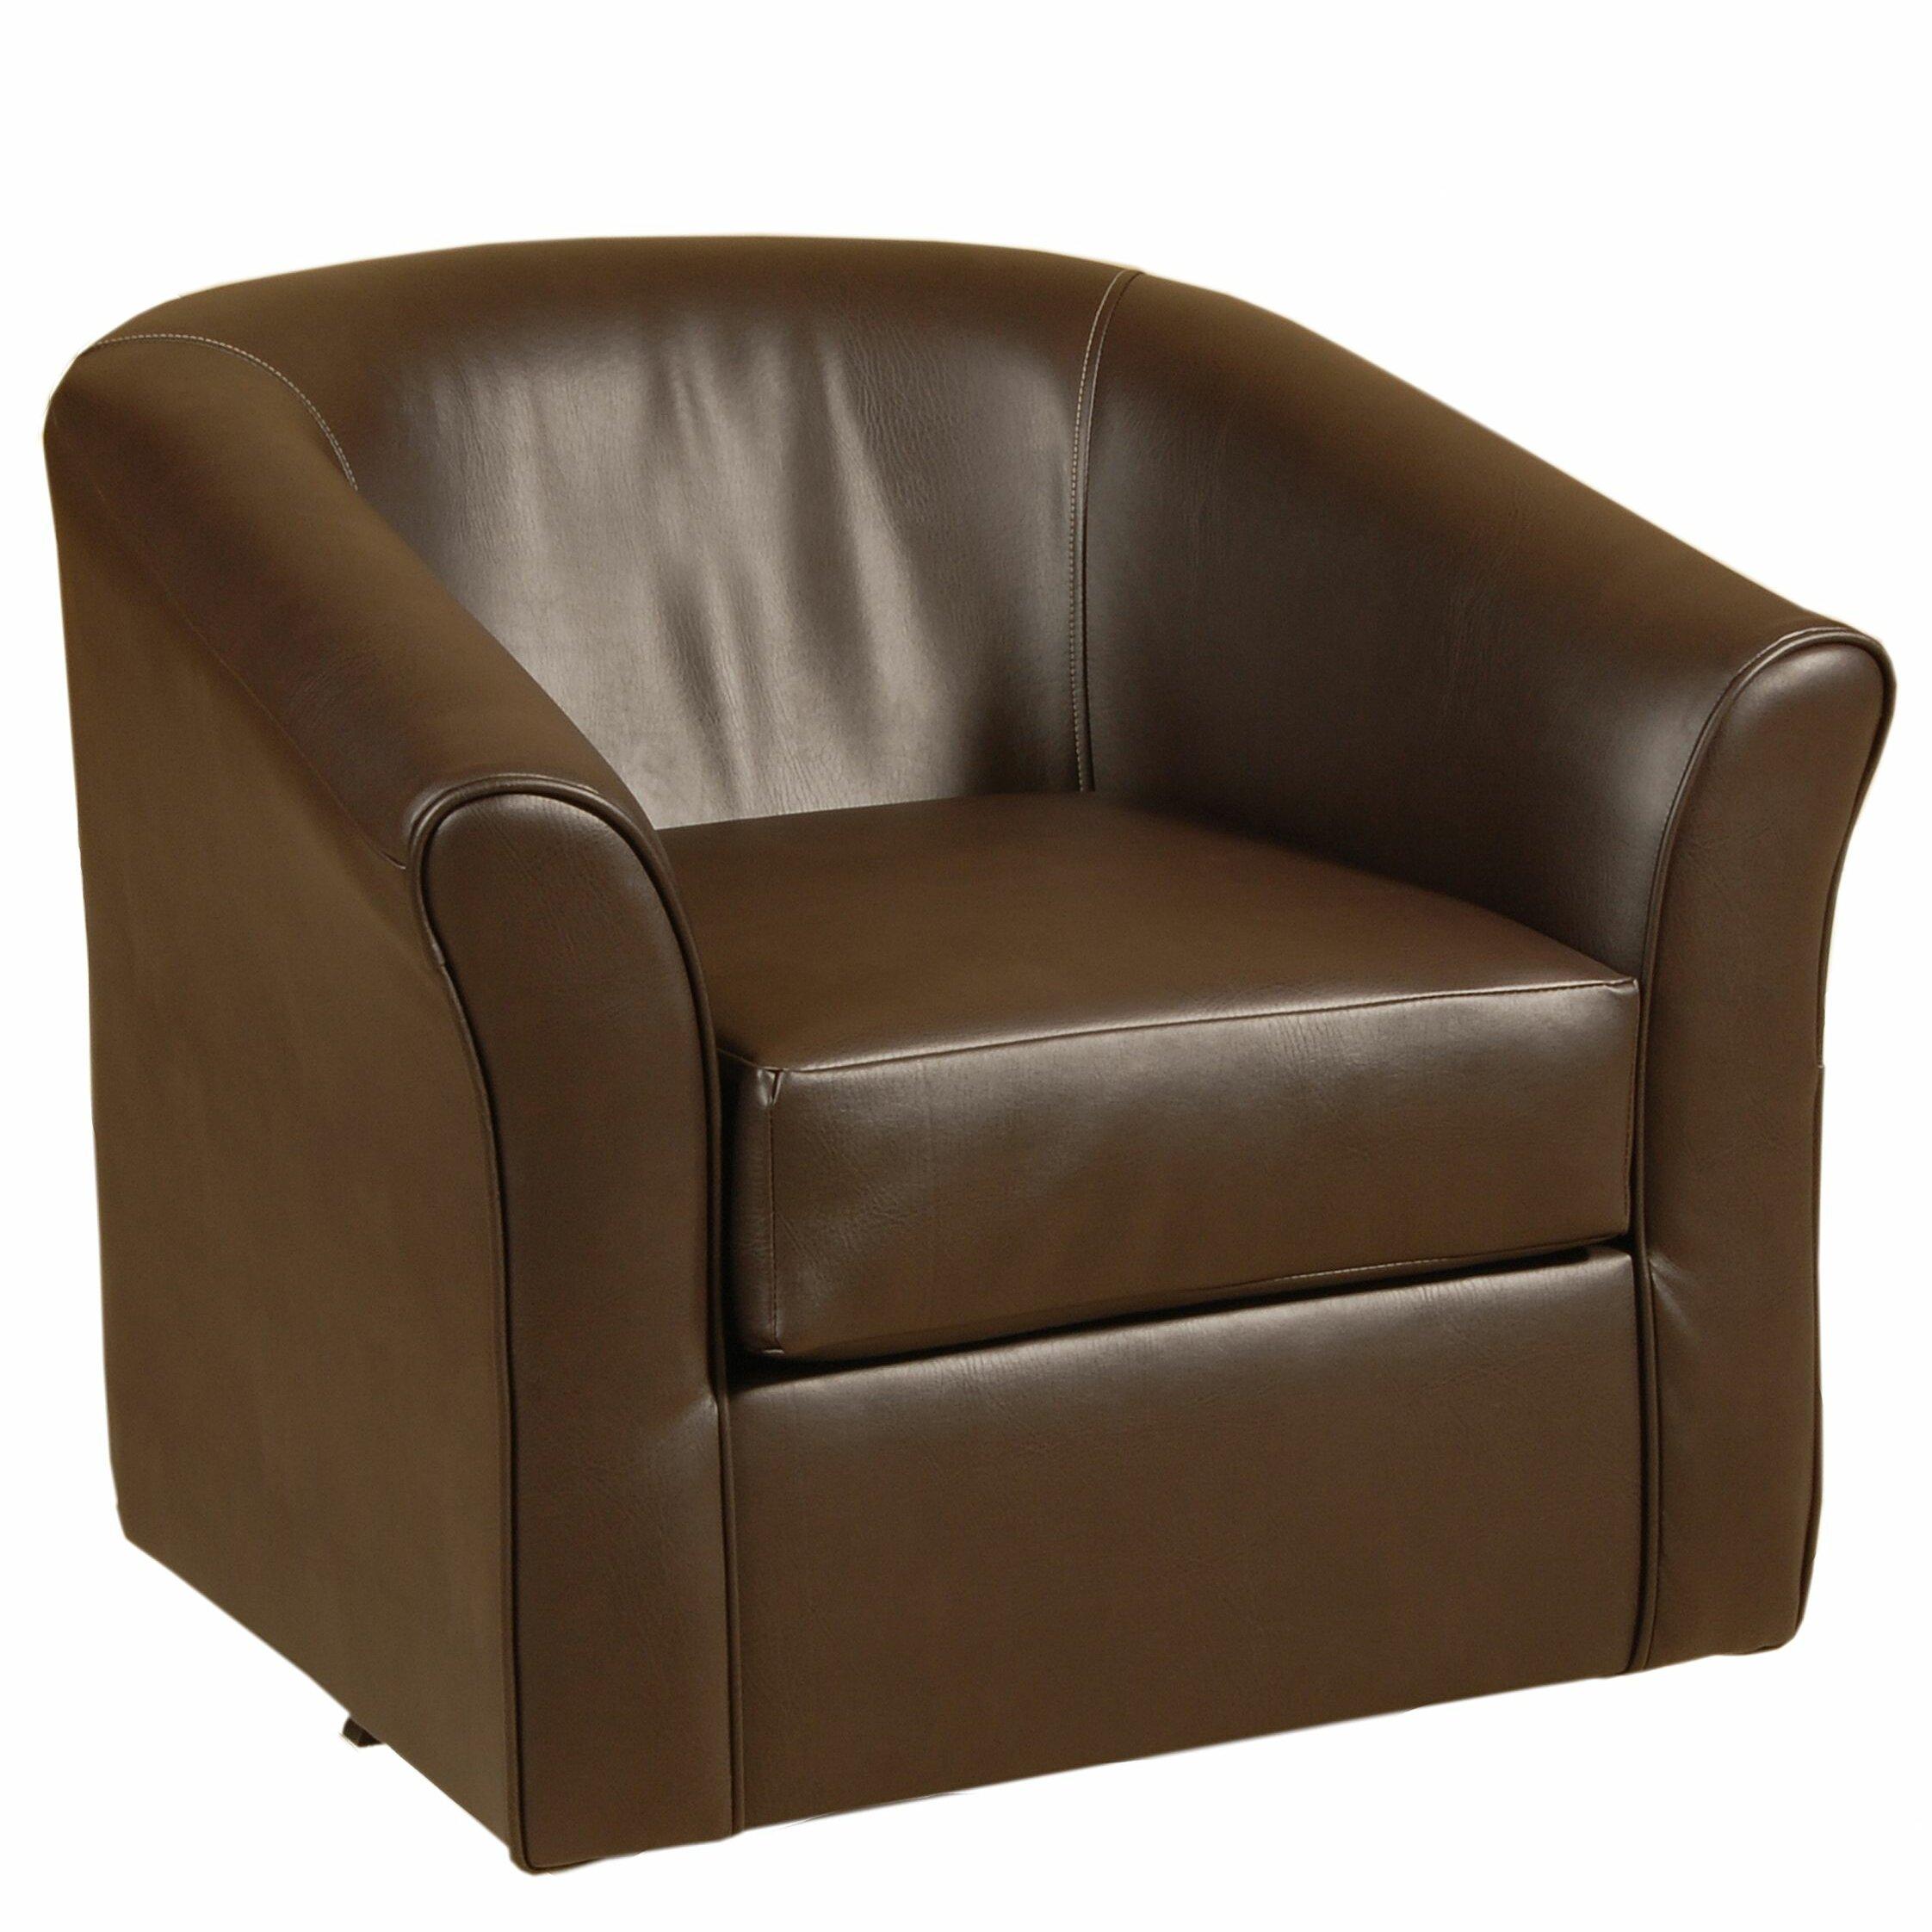 Serta Upholstery Swivel Tub Barrel Chair Amp Reviews Wayfair